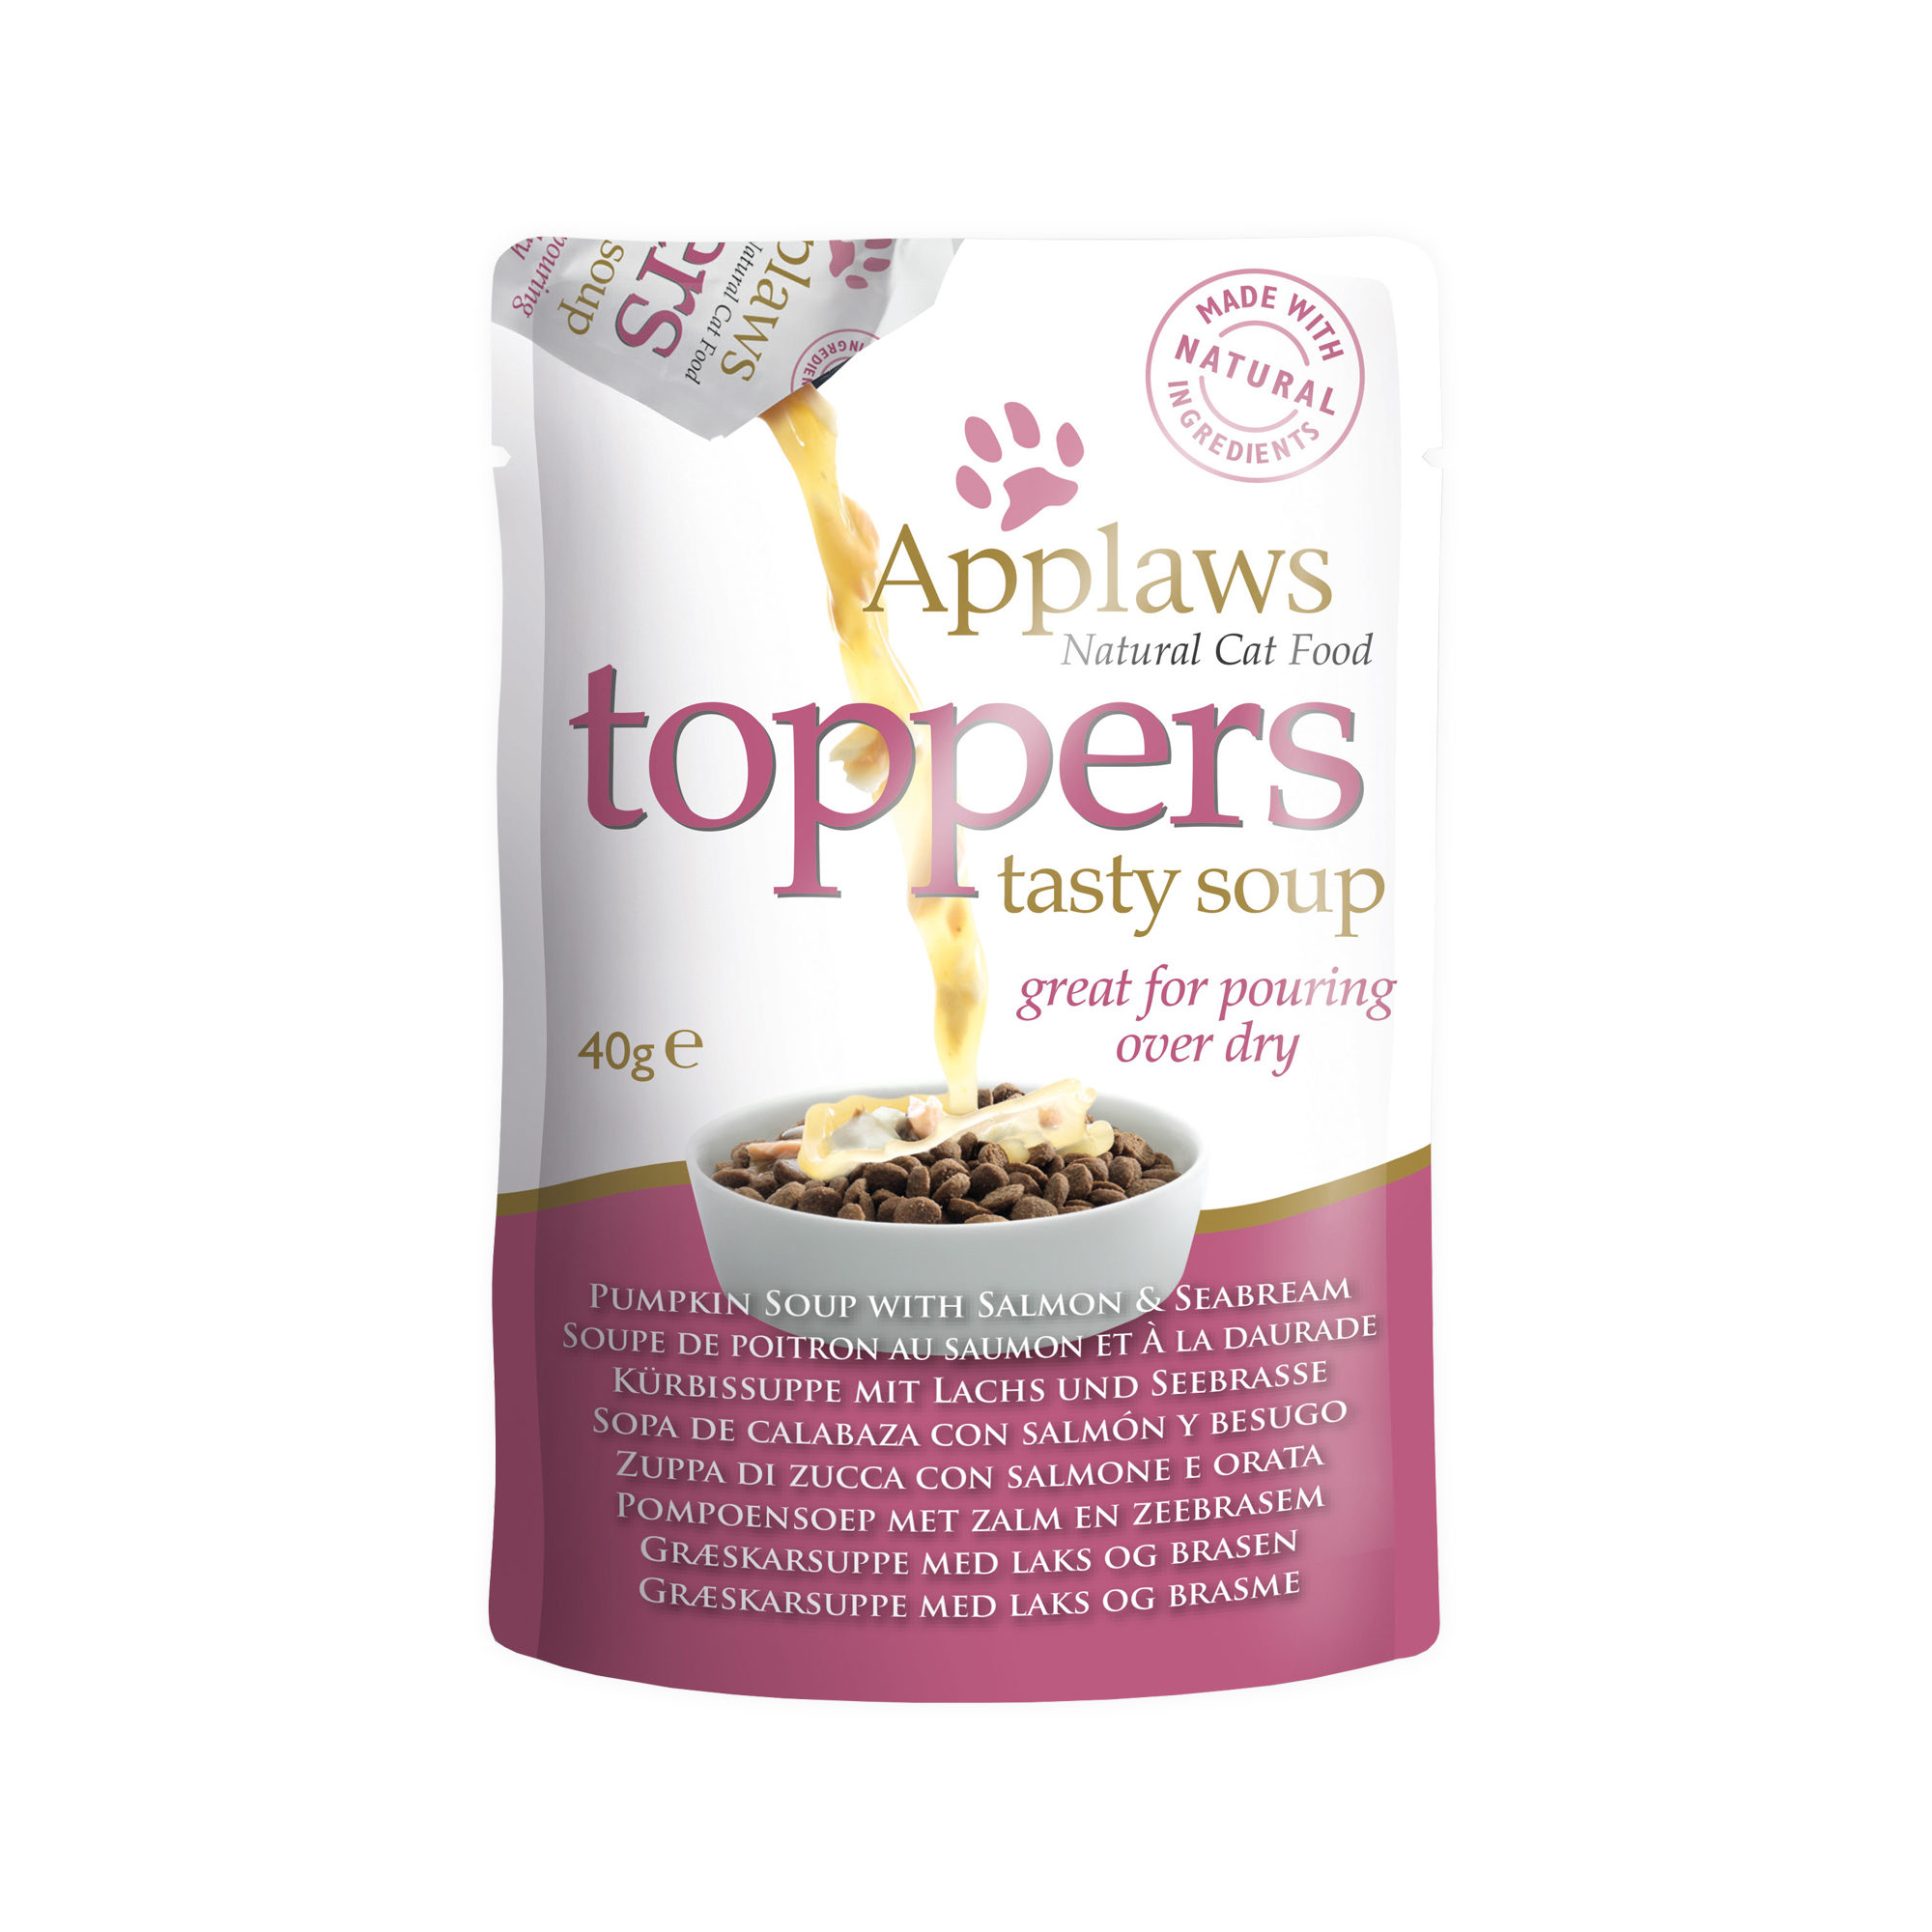 Applaws Toppers Tasty Soup Katzenfutter - Frischebeutel - Salmon & Seabream